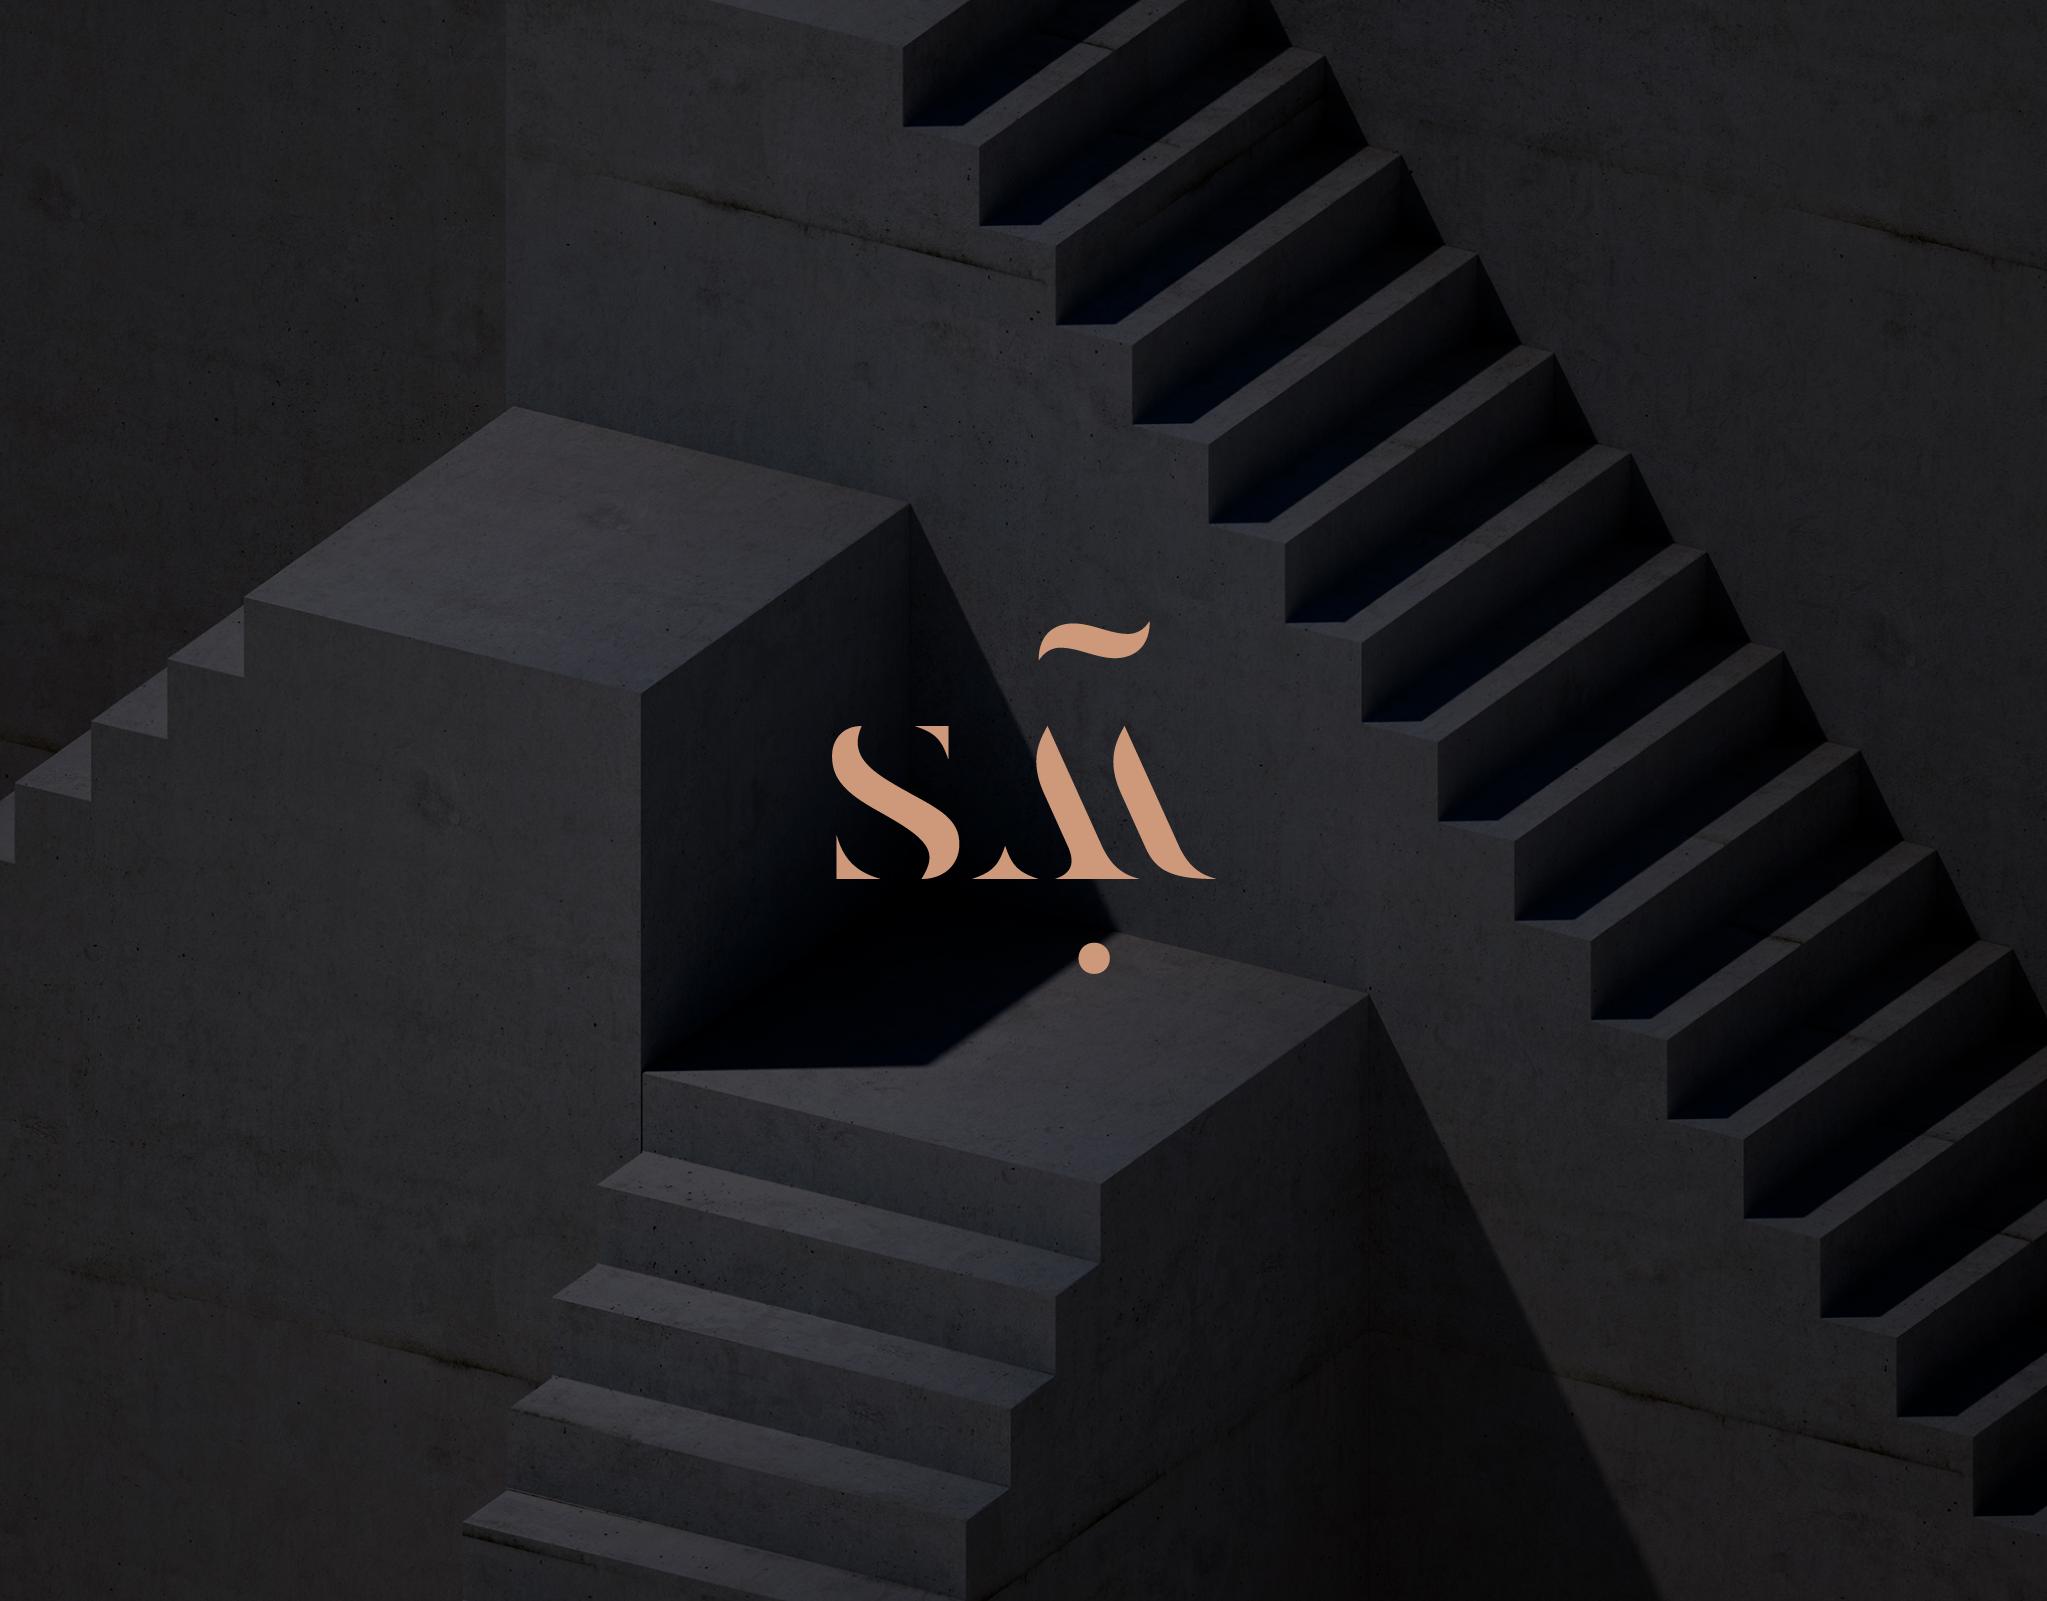 SM - BRAND IDENTITY